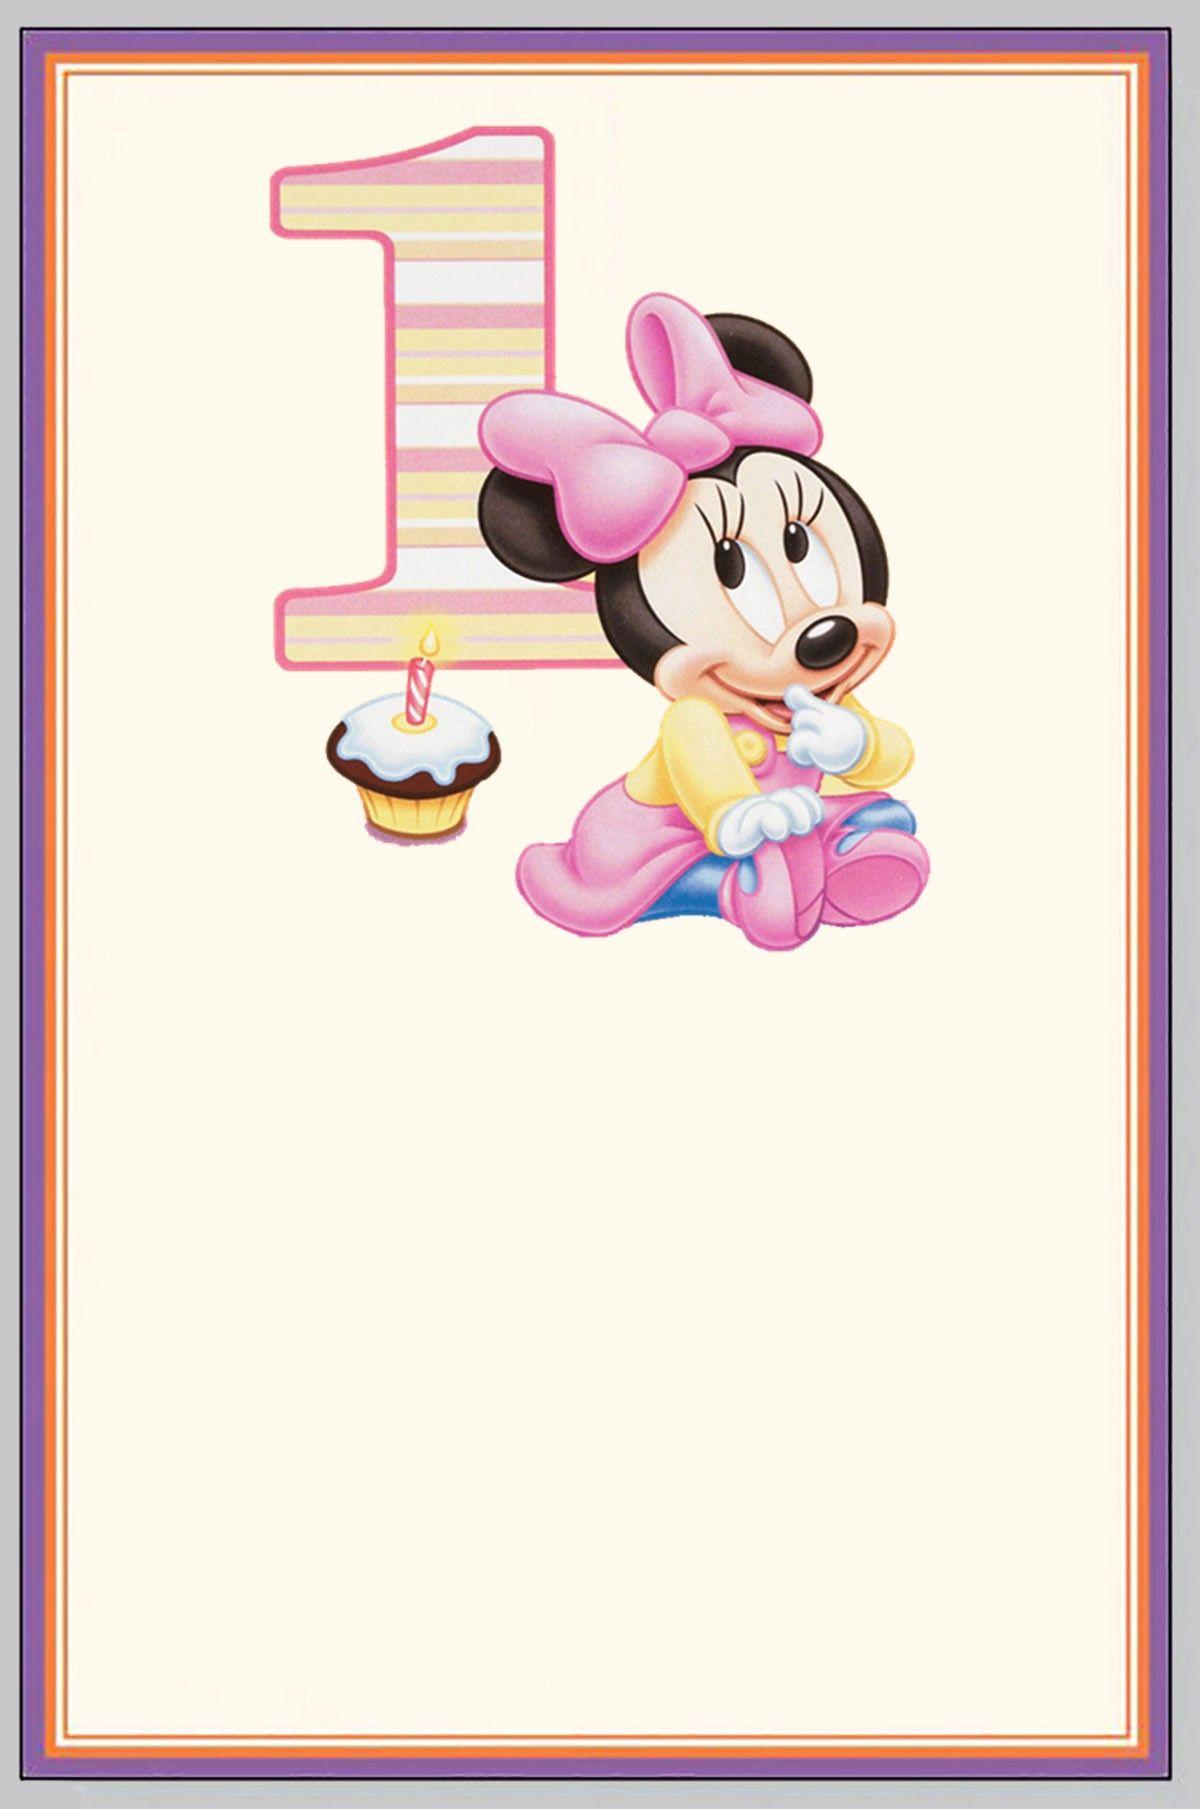 Minnie mouse first birthday invitation card coolest invitation minnie mouse first birthday invitation card filmwisefo